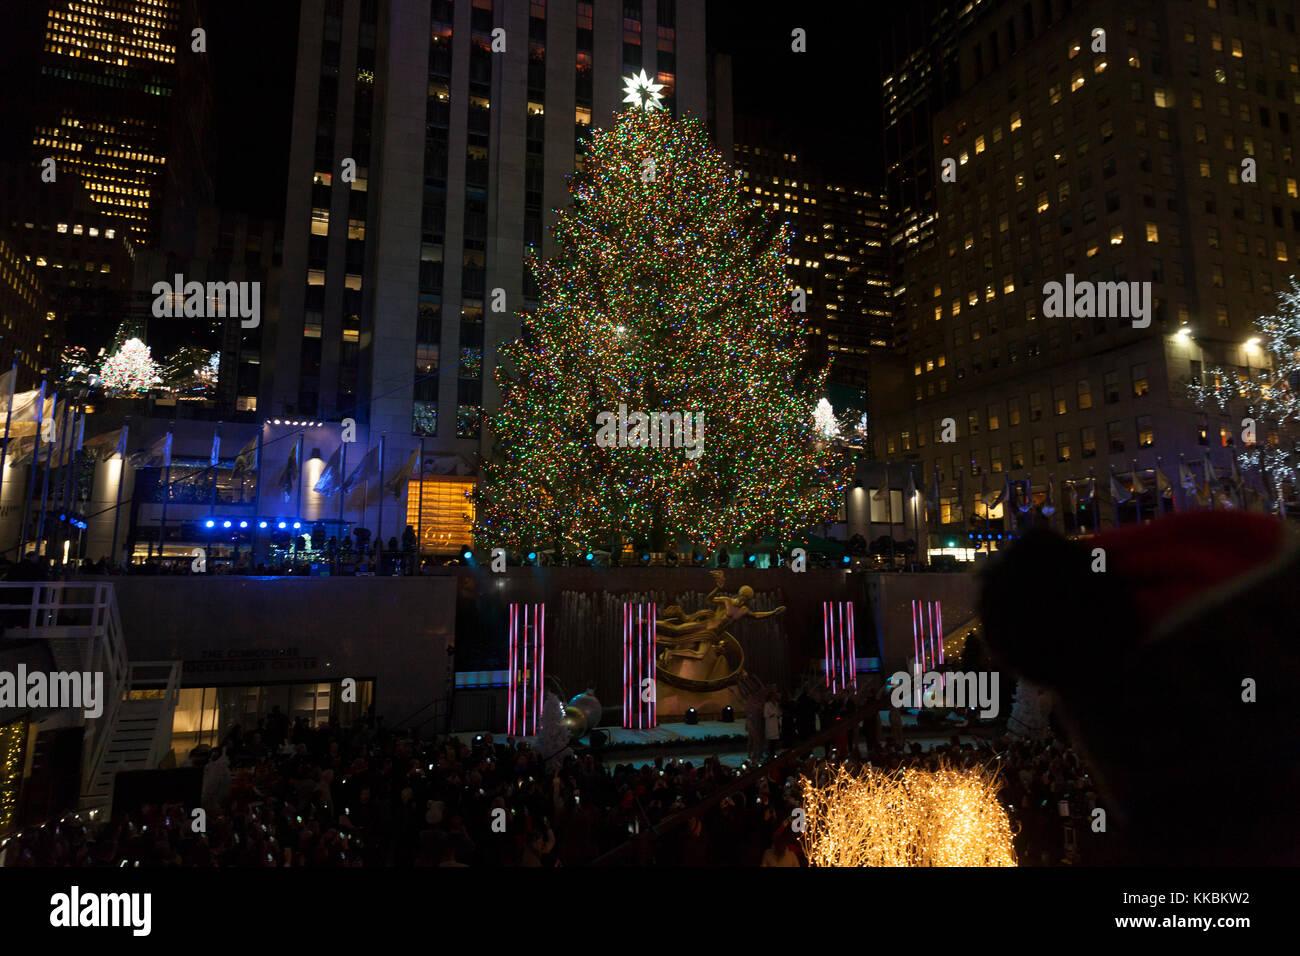 Nbc christmas tree lighting 2014 for New york in christmas 2017